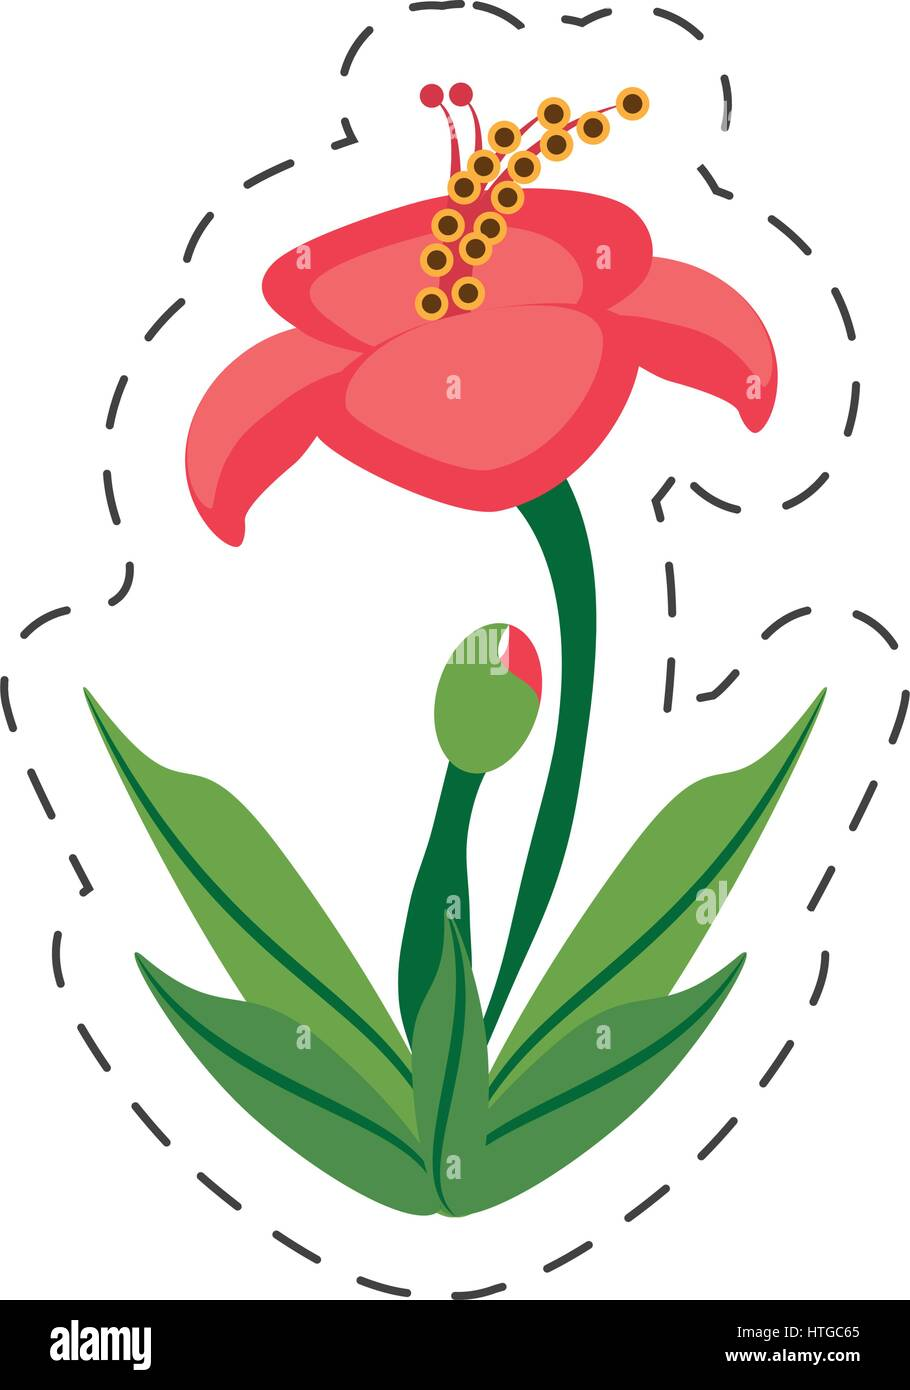 Cartoon Hibiscus Flower Image Stock Vector Art Illustration